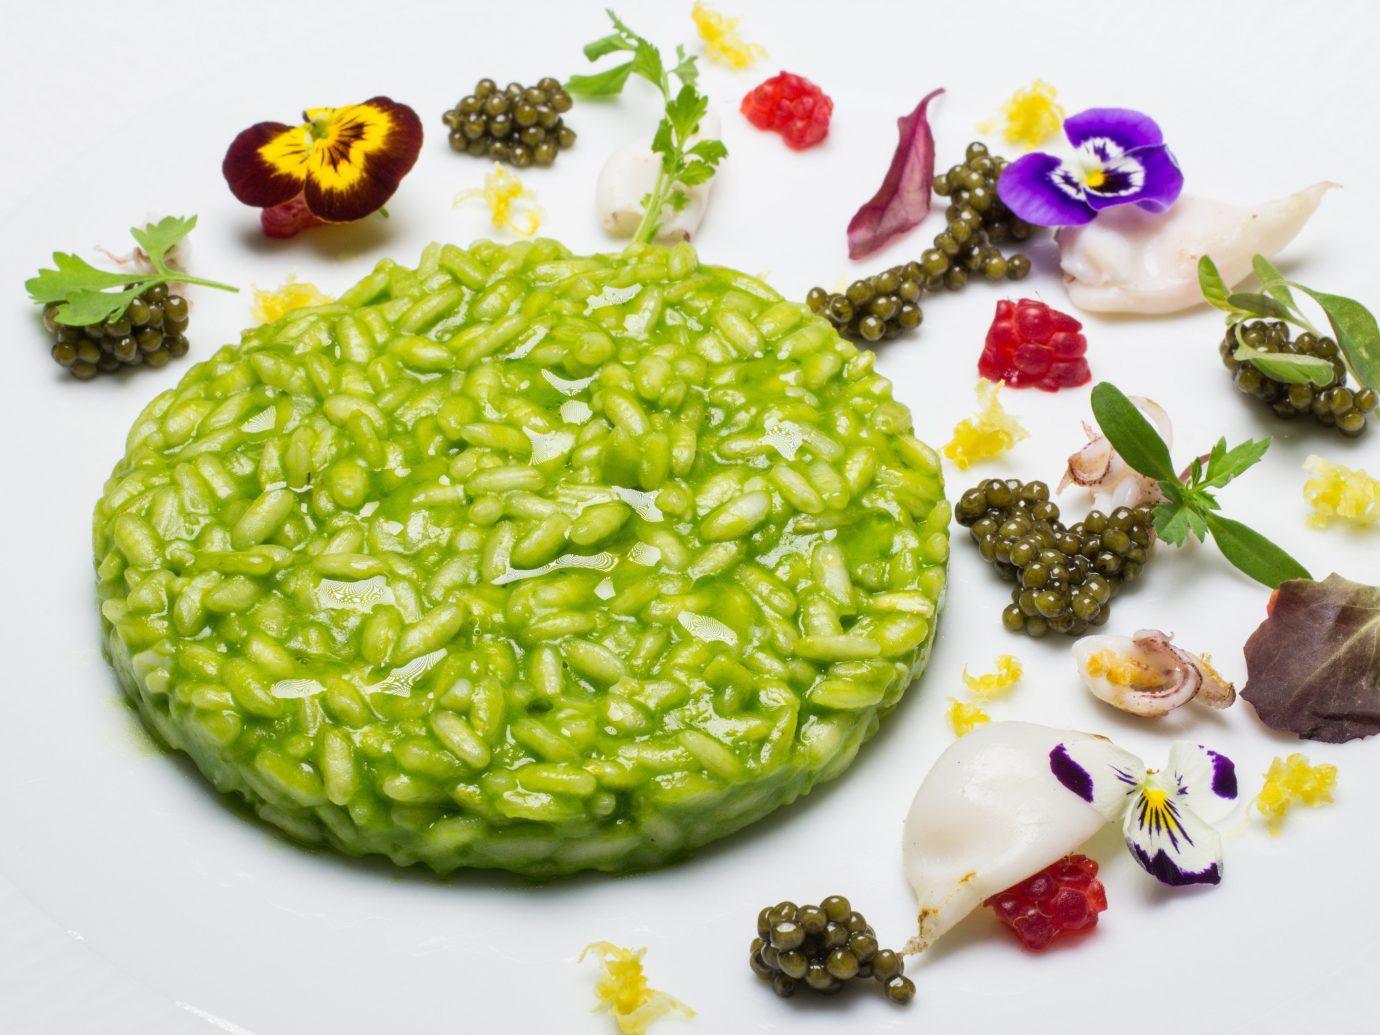 Food + Drink plate dish food cuisine produce plant vegetable land plant vegetarian food meal flowering plant arranged sliced fresh